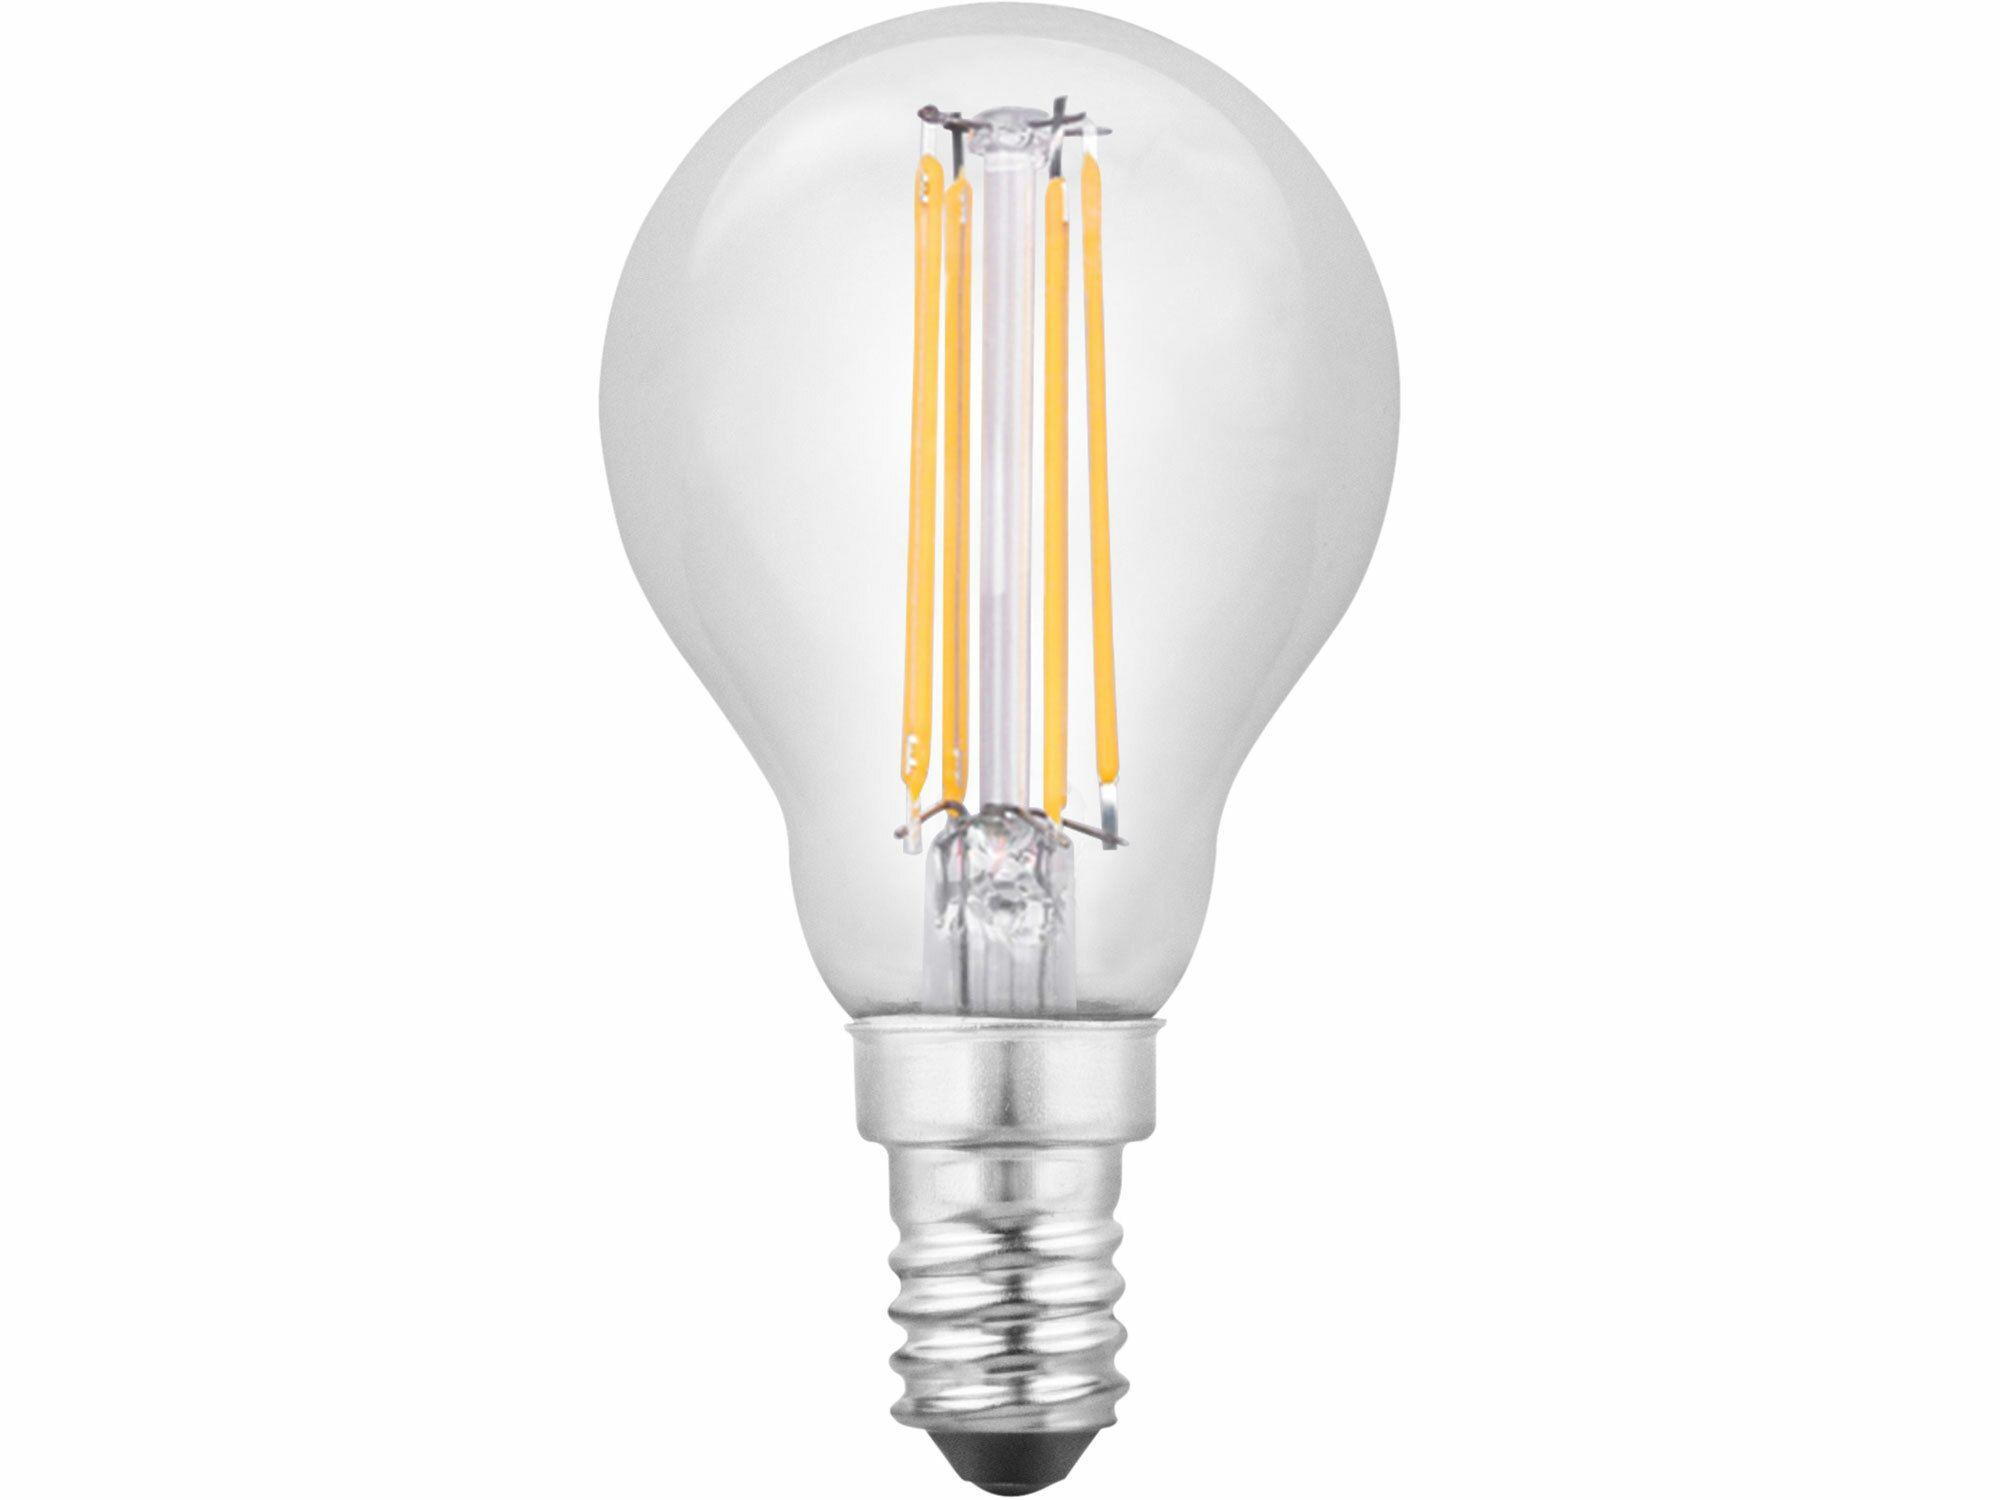 Žárovka LED 360°, 400lm, 4W, E14, teplá bílá EXTOL-LIGHT